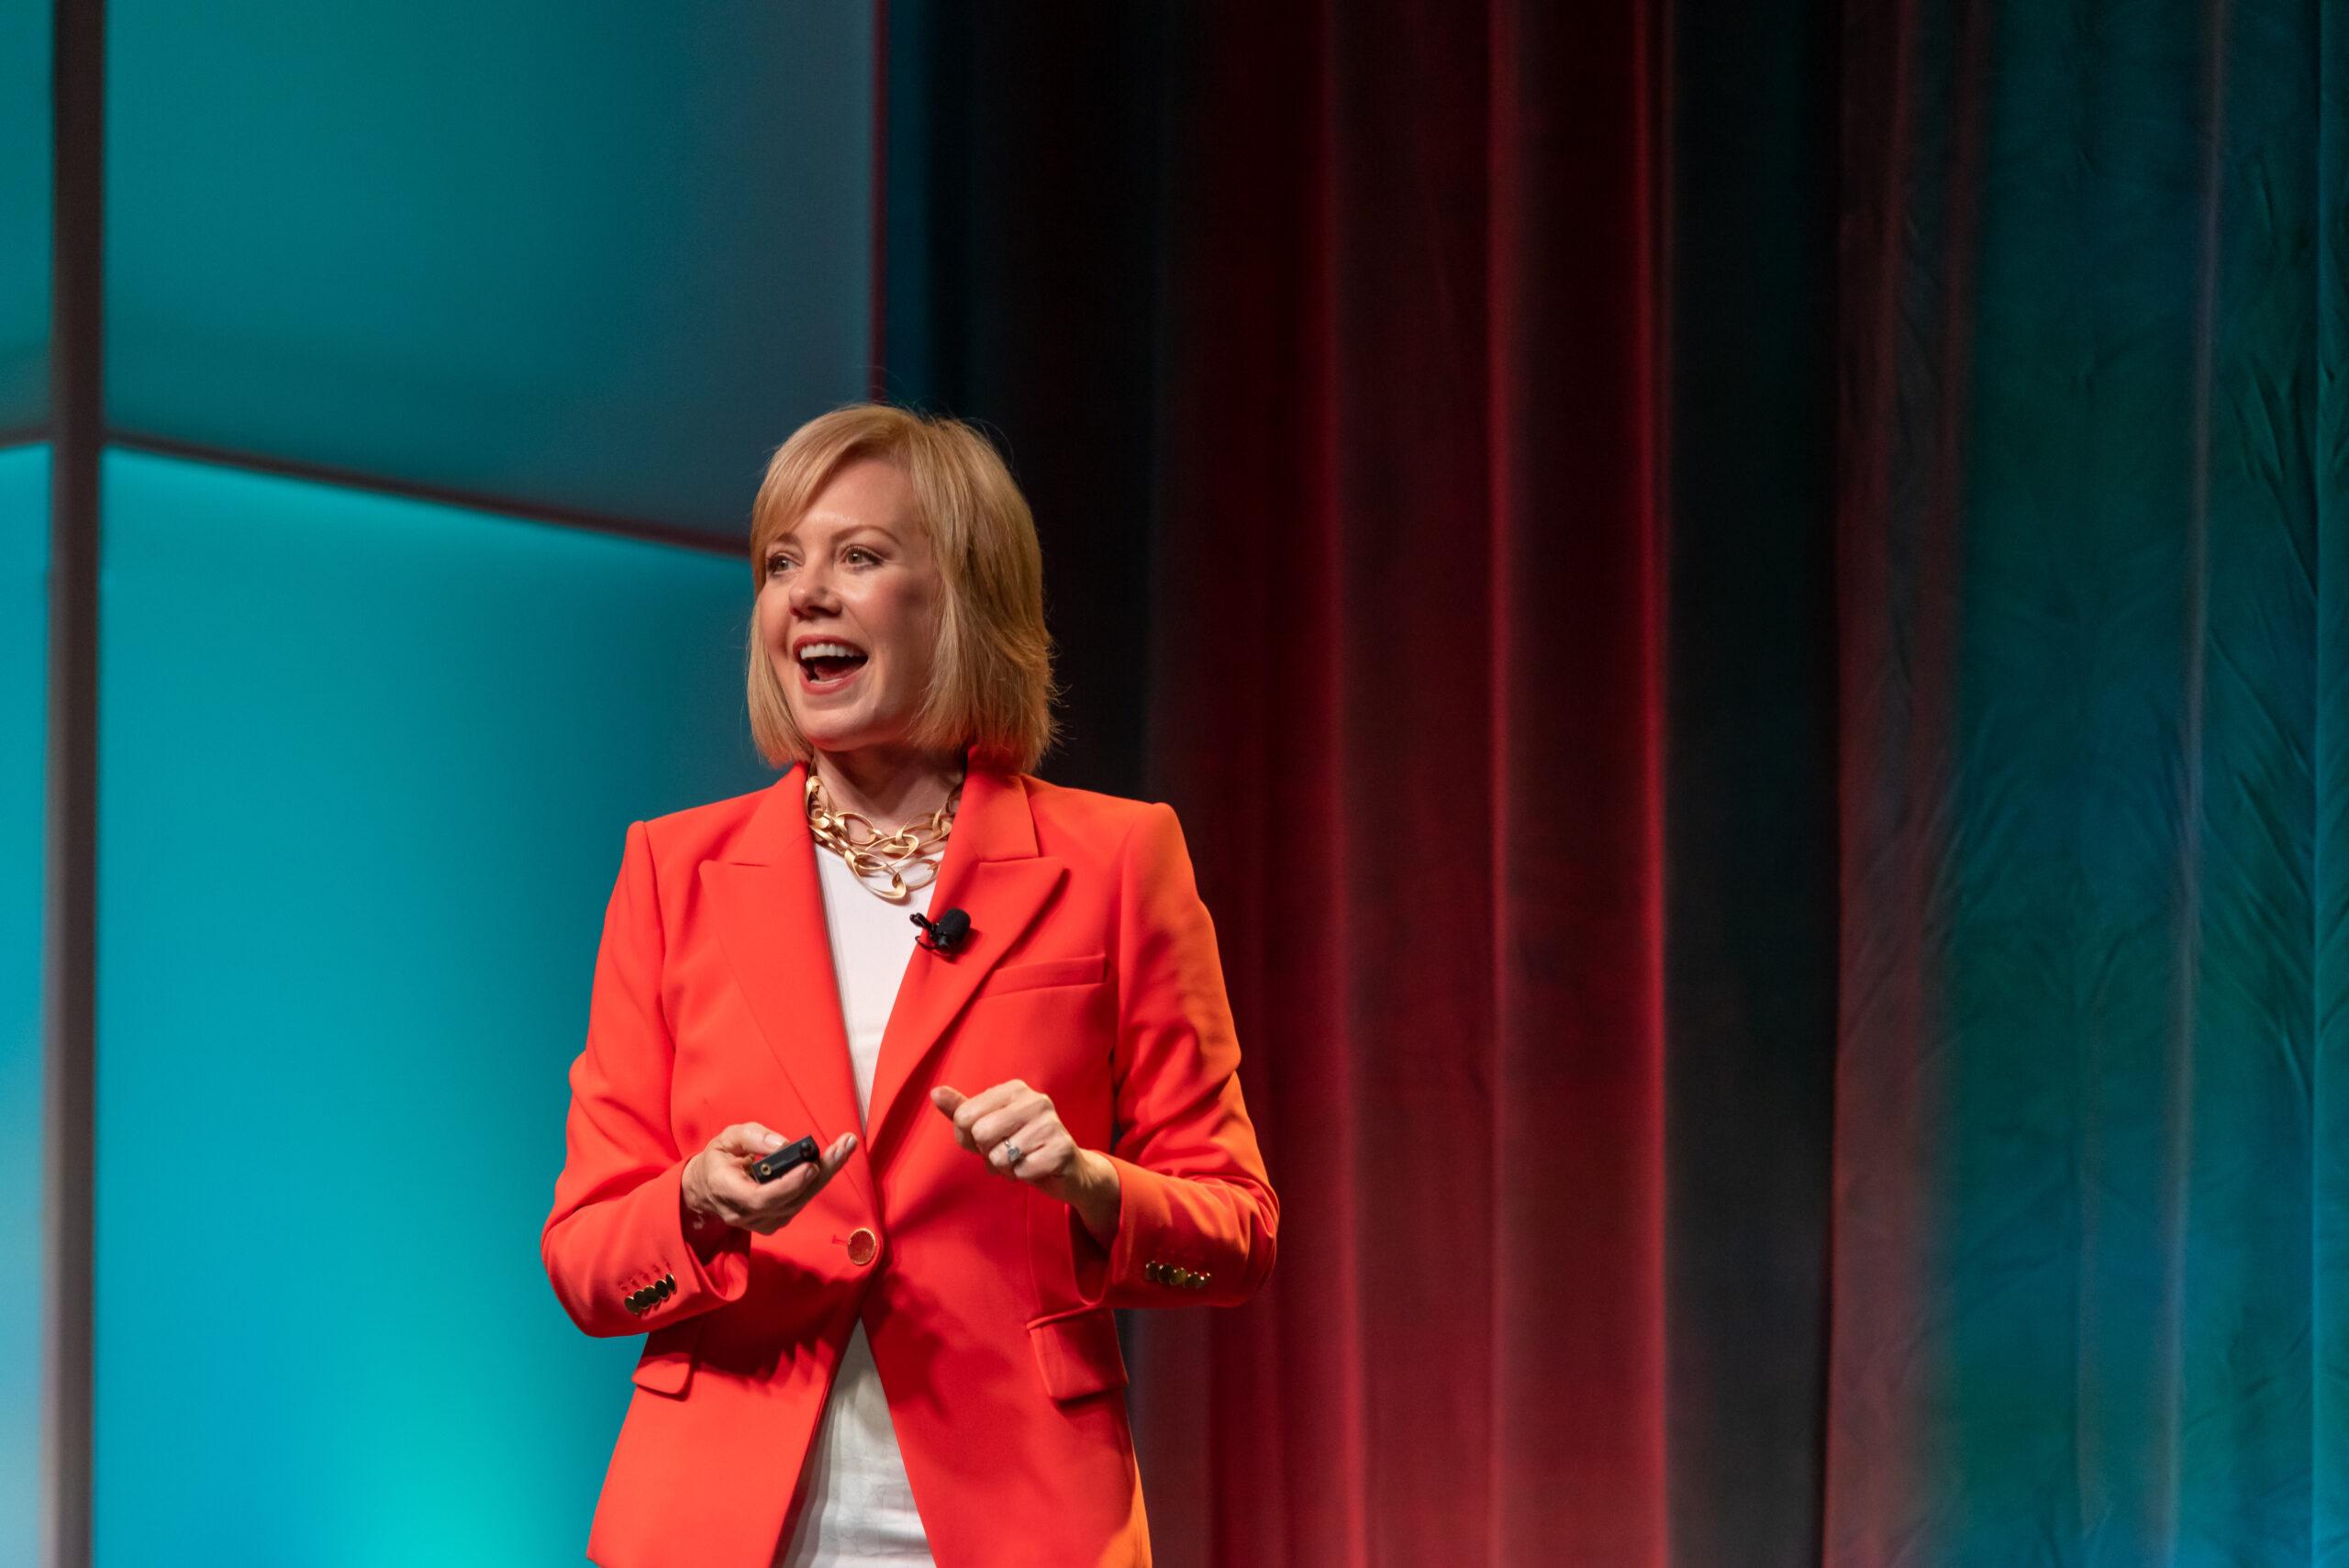 Ginger Hardage, Keynote Speaker, Artia Crossroads Conference 2021